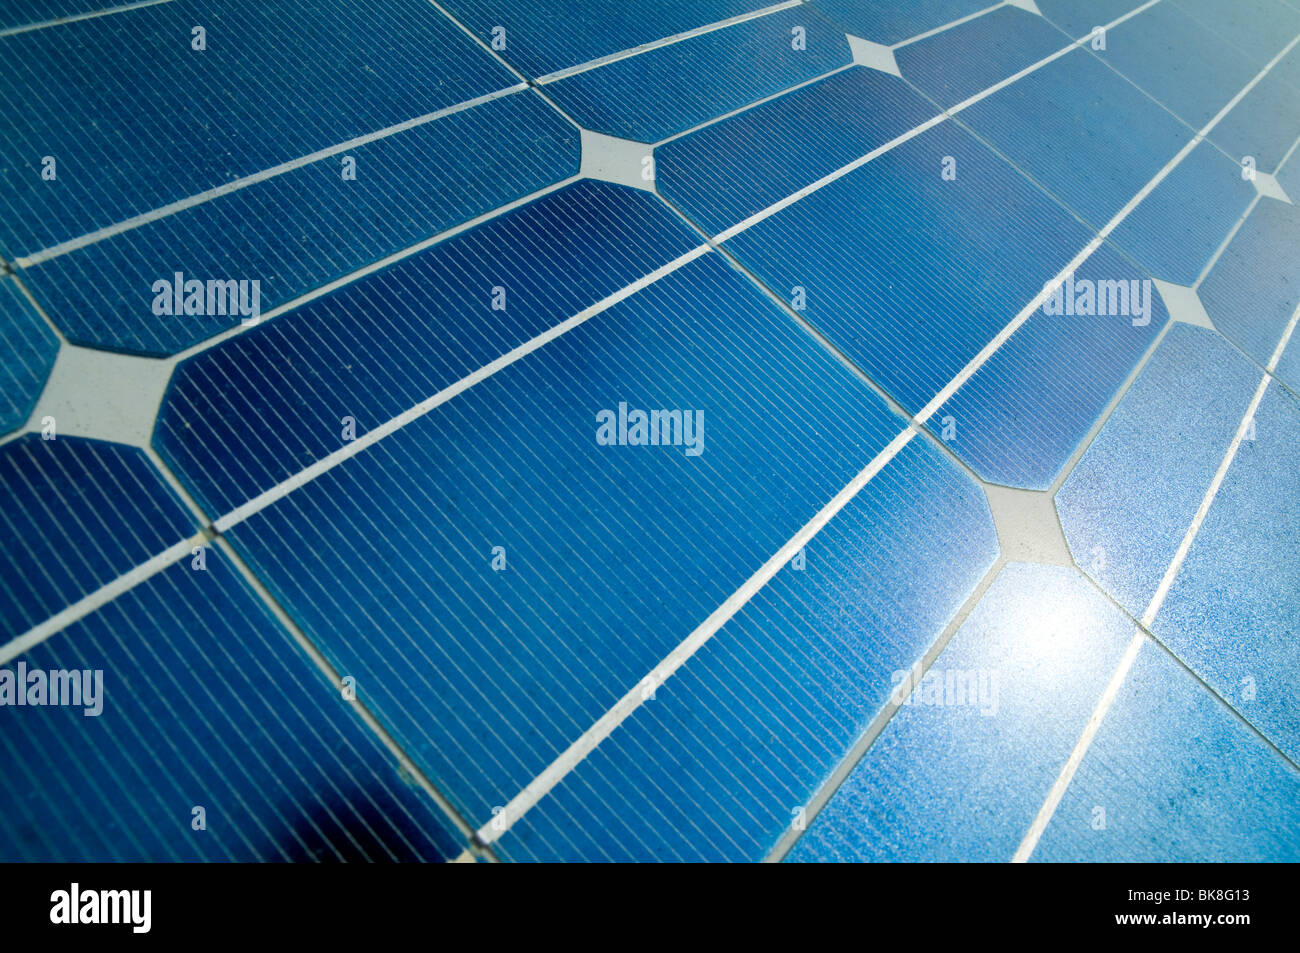 Detail solar panel - Stock Image